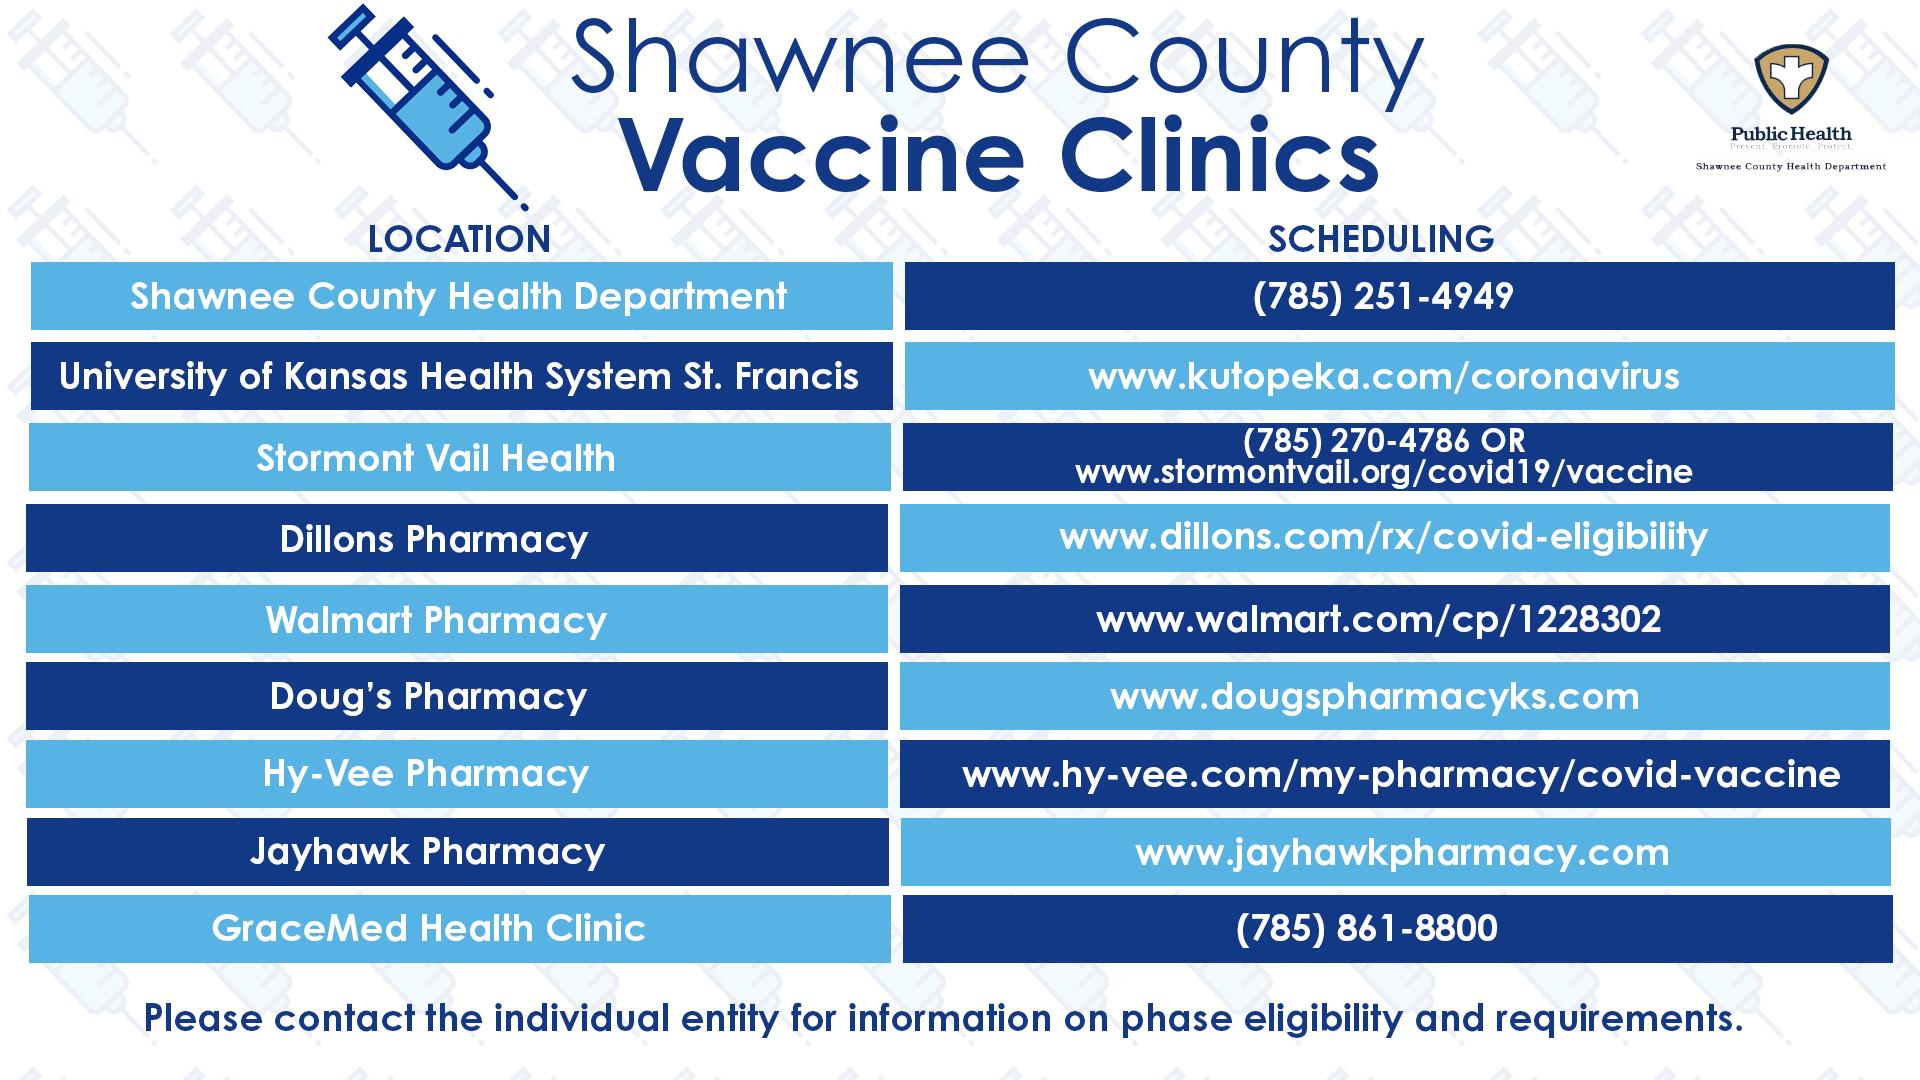 Shawnee County Vaccine Providers